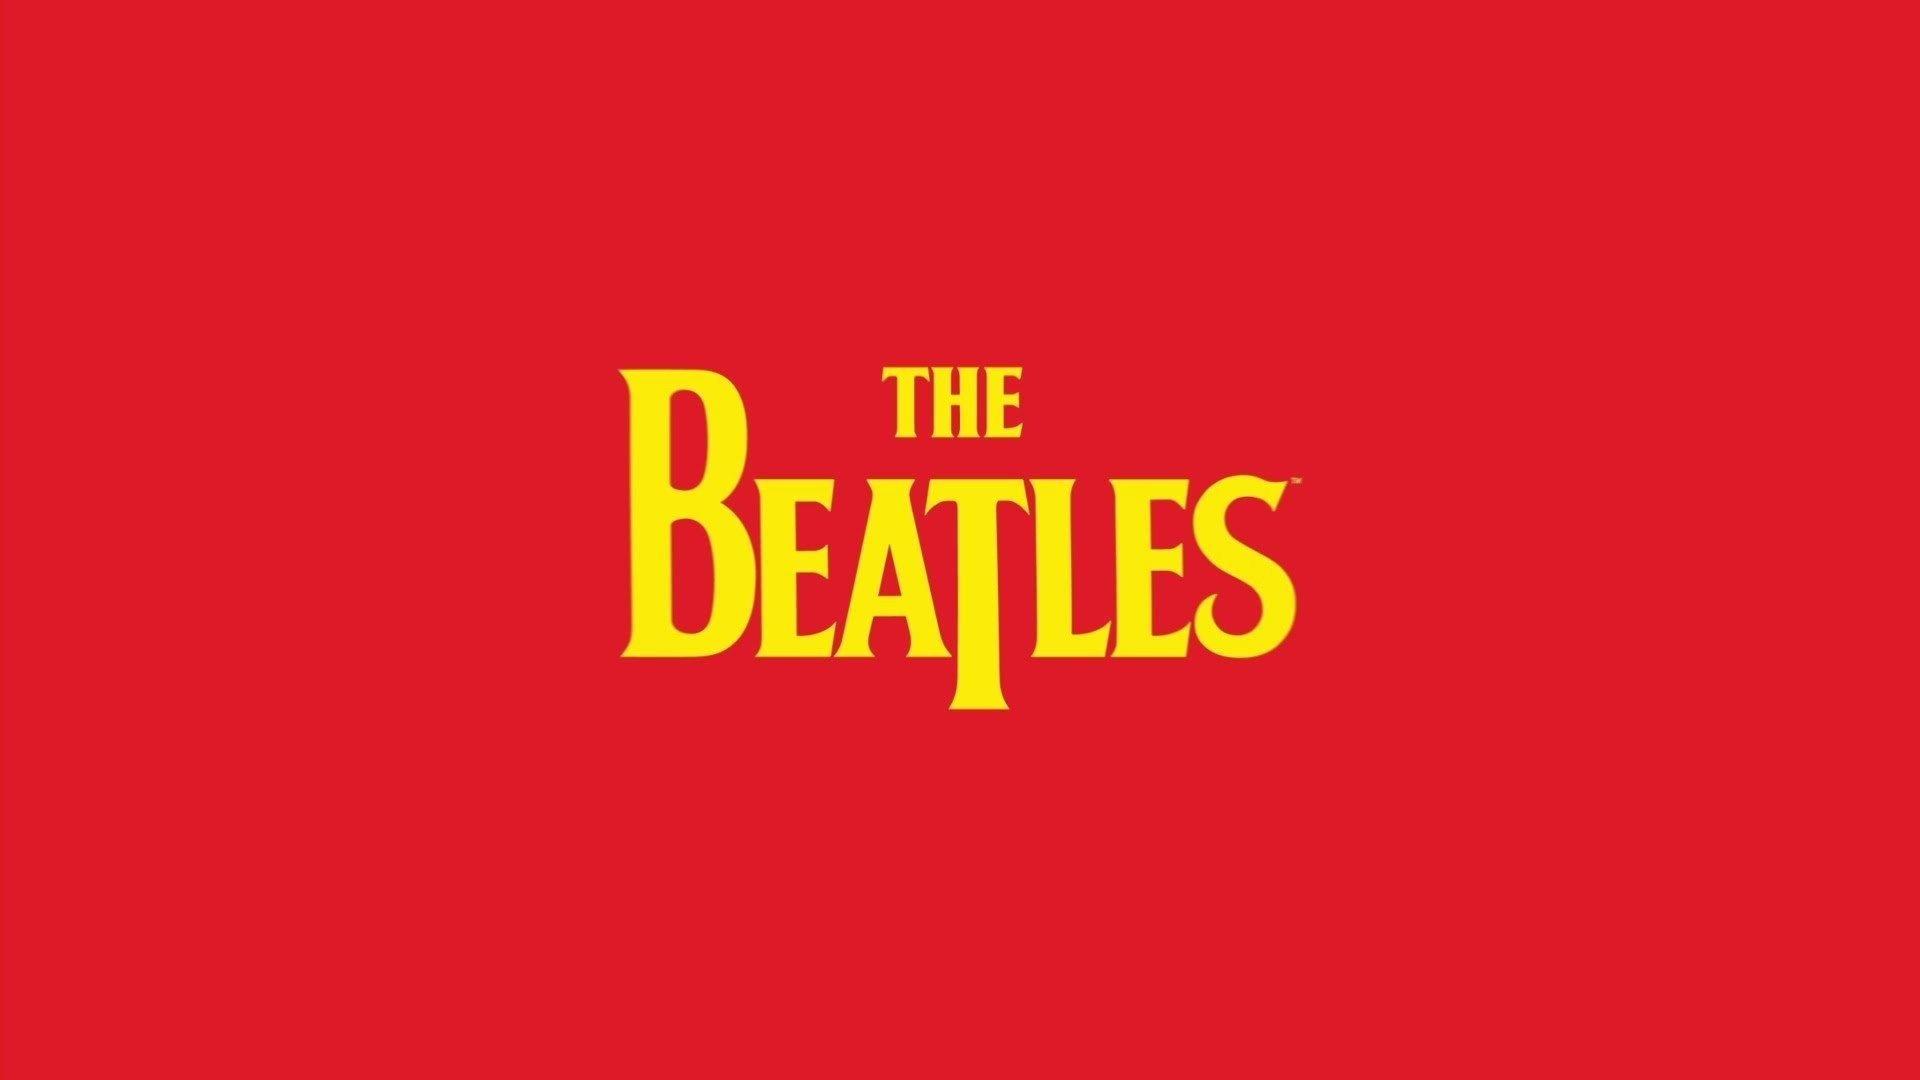 Amazing Wallpaper Logo The Beatles - c67a31ba7296087352a0b961f31c0844  2018_6438.jpg